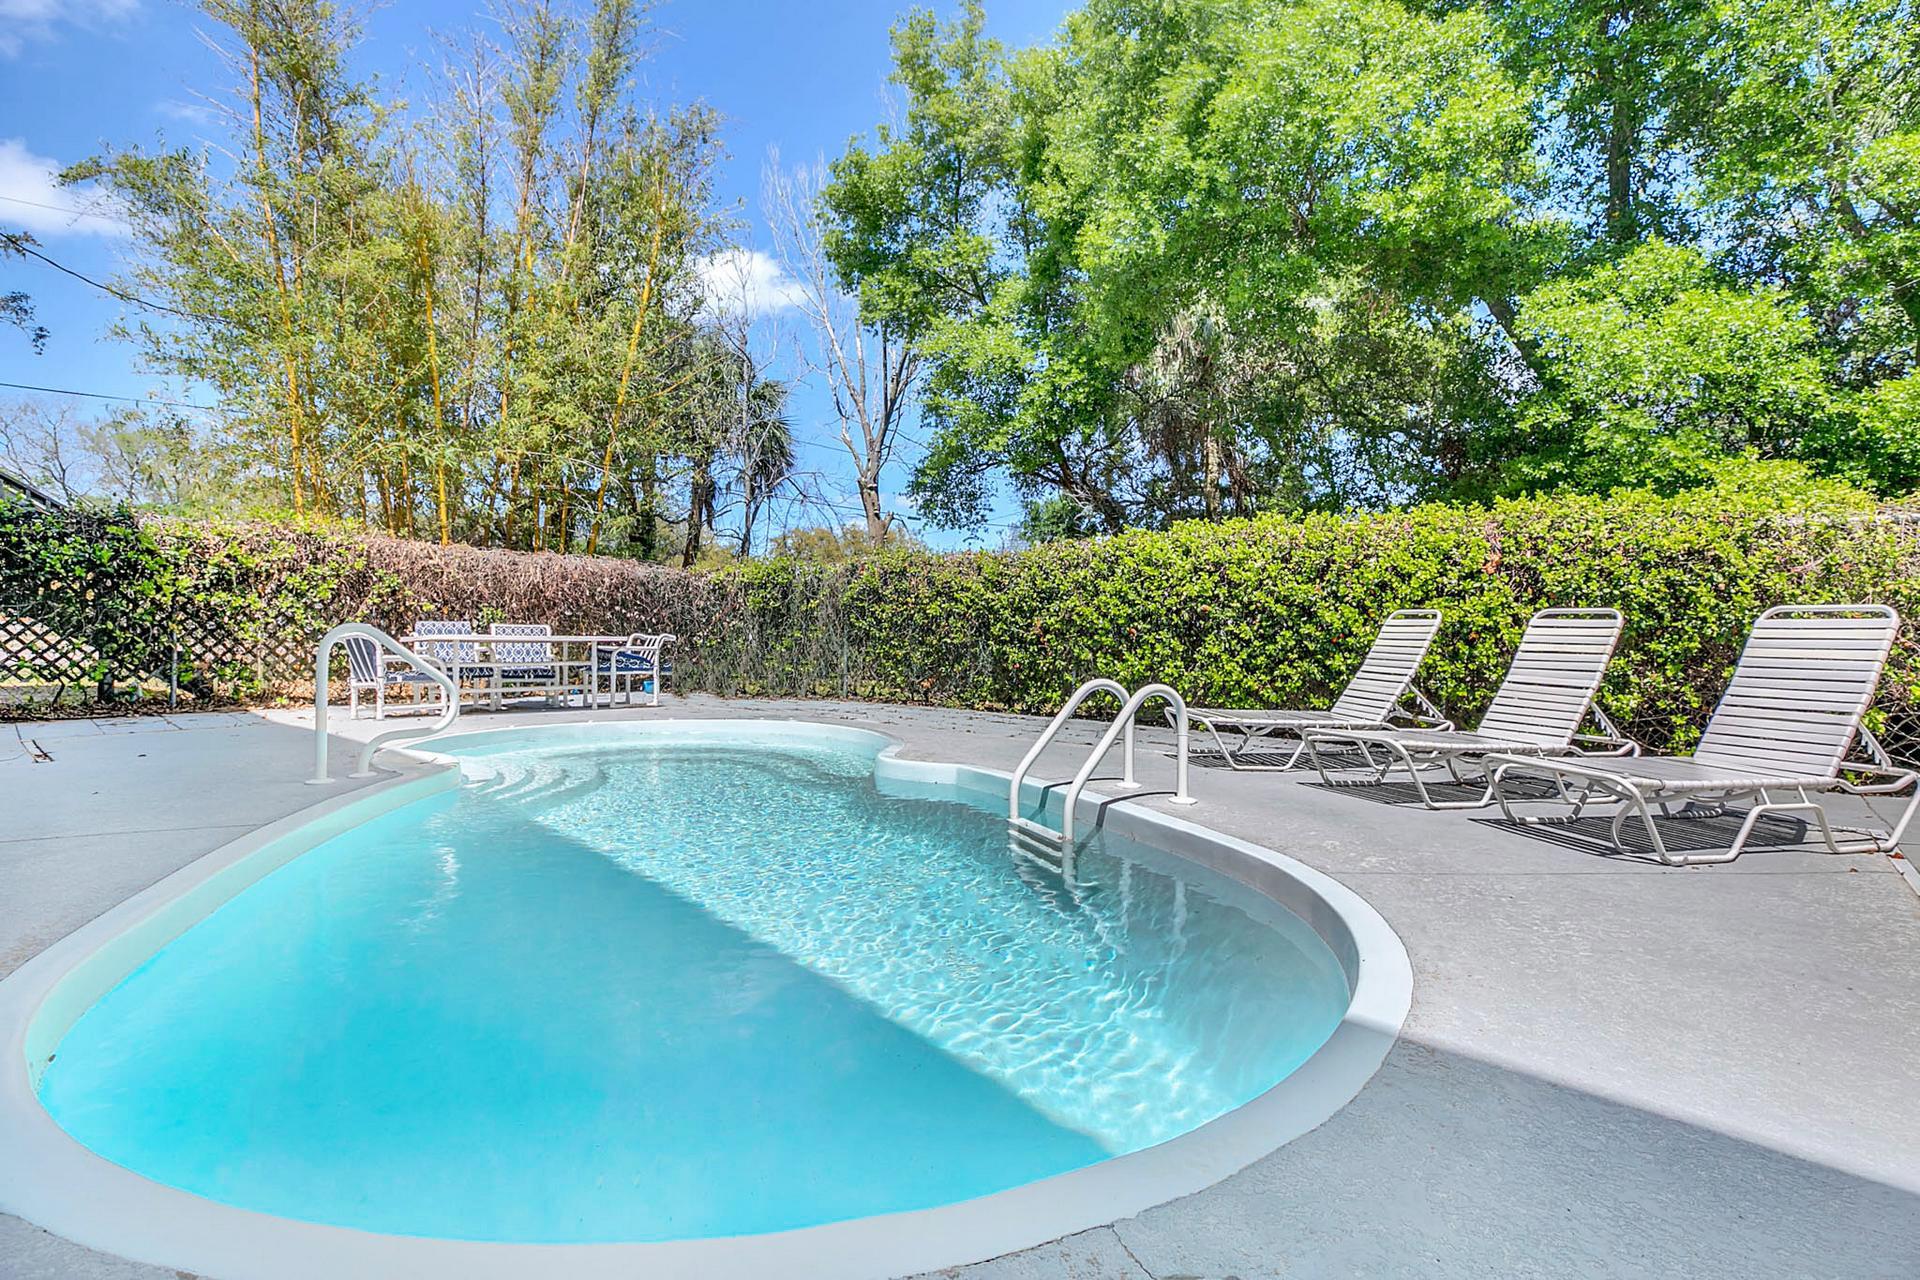 Tarpon Springs FL Vacation Rental Welcome to Tarpon